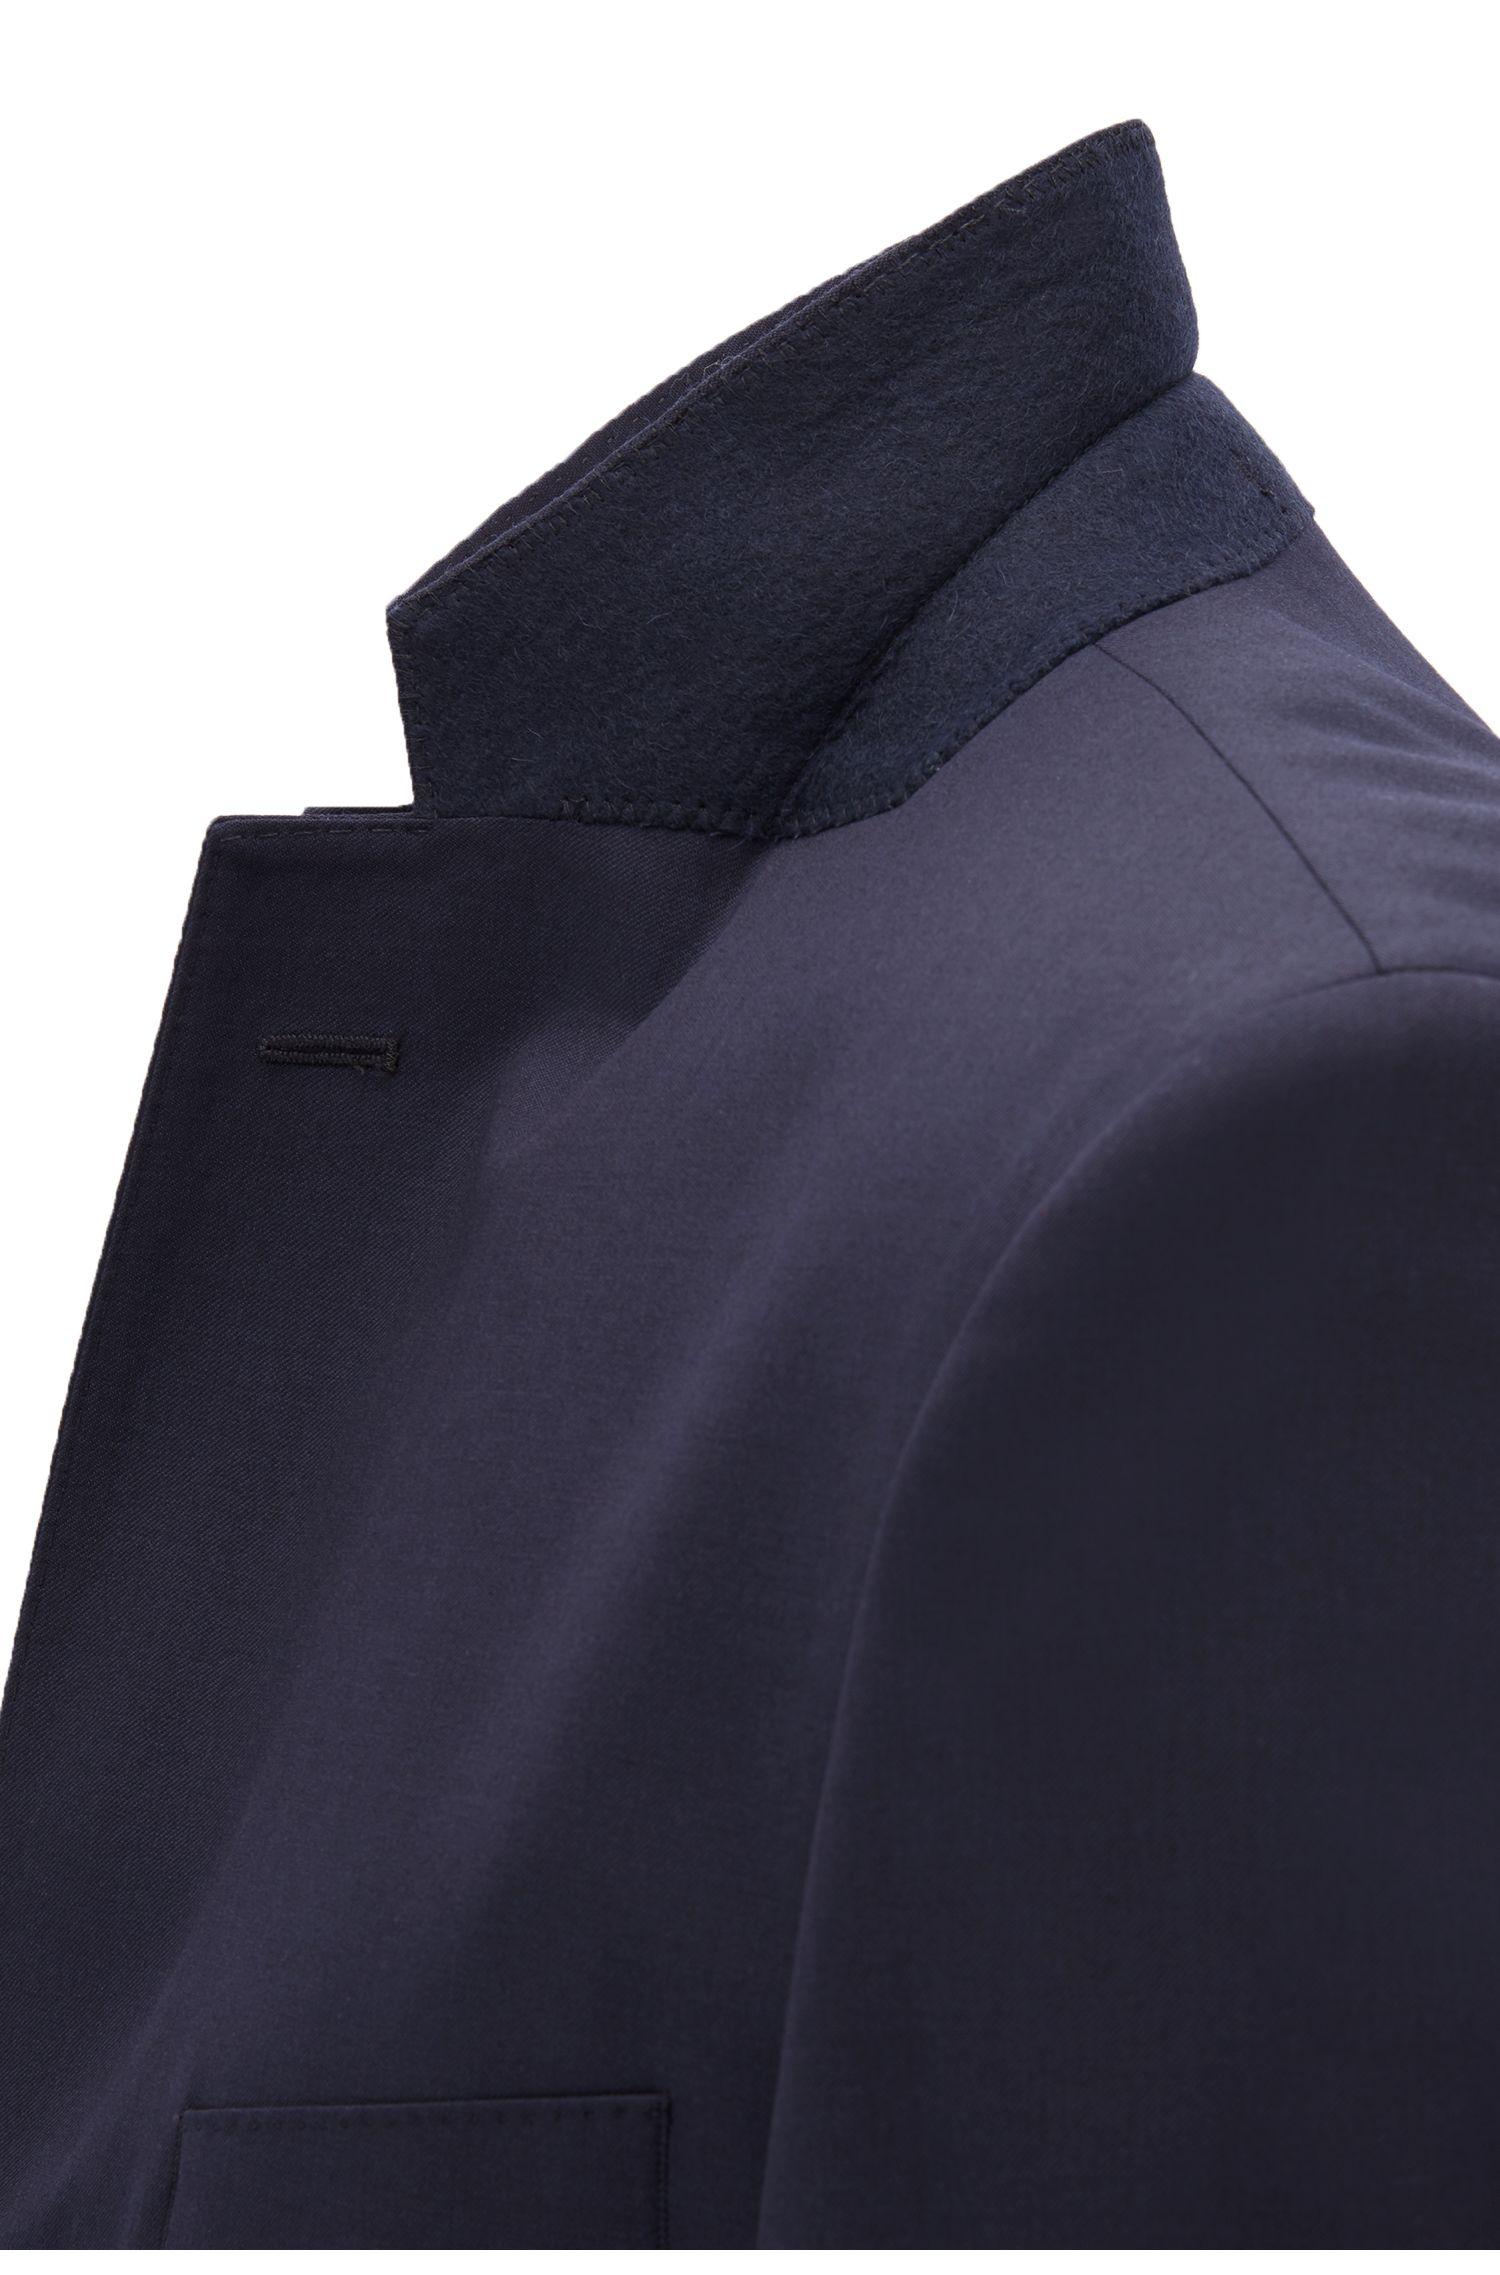 Regular-fit colbert van scheerwol met AMF-sierstiksels, Donkerblauw